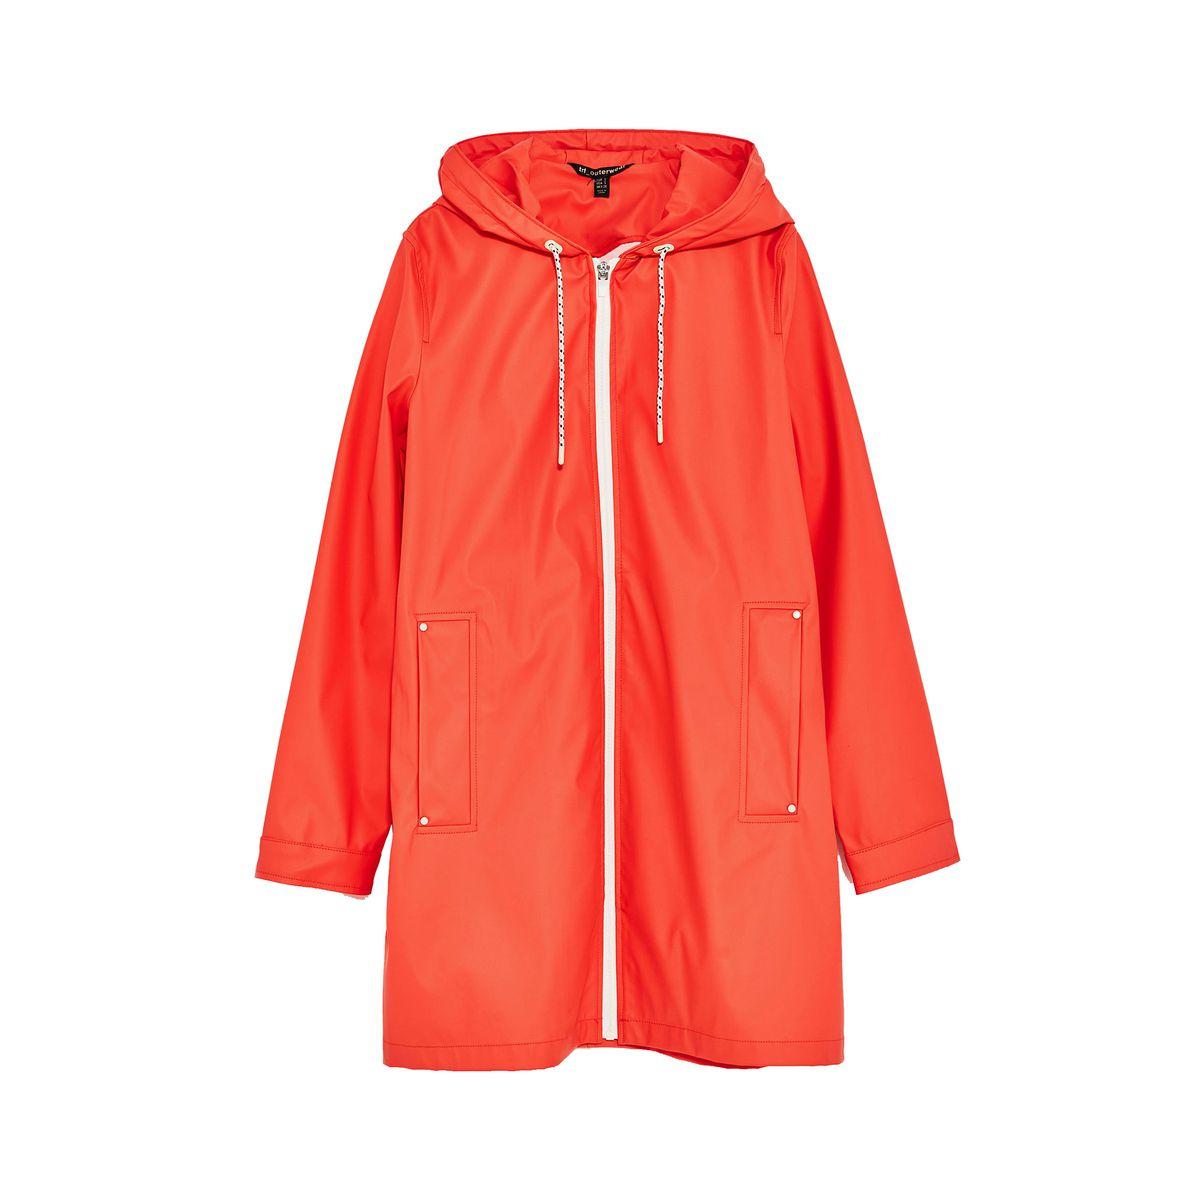 An orange rain coat with hood